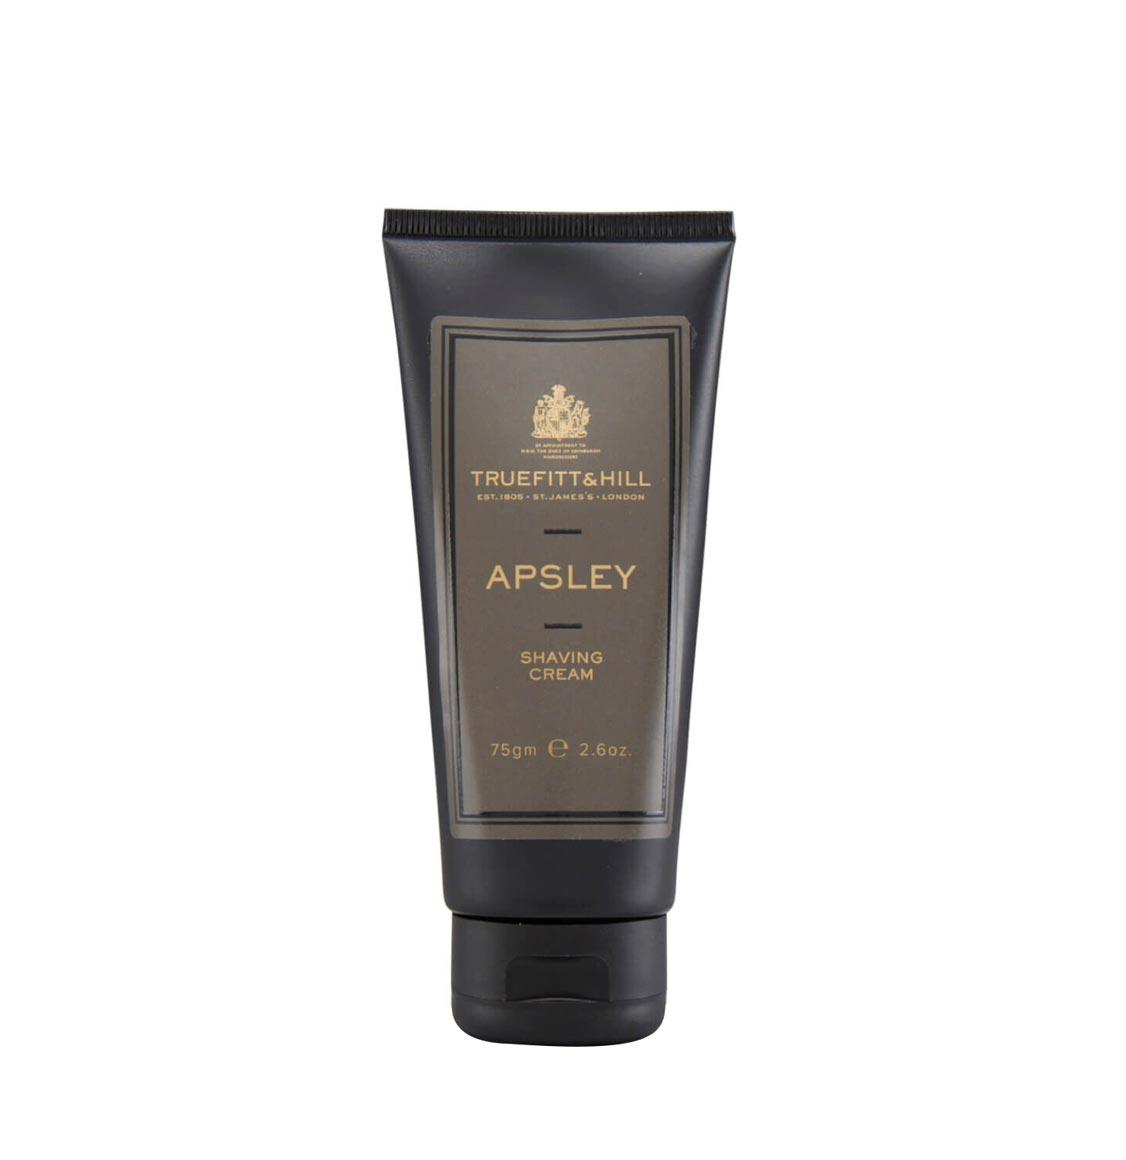 Truefitt And Hill Apsley Shaving Cream Tube 75g